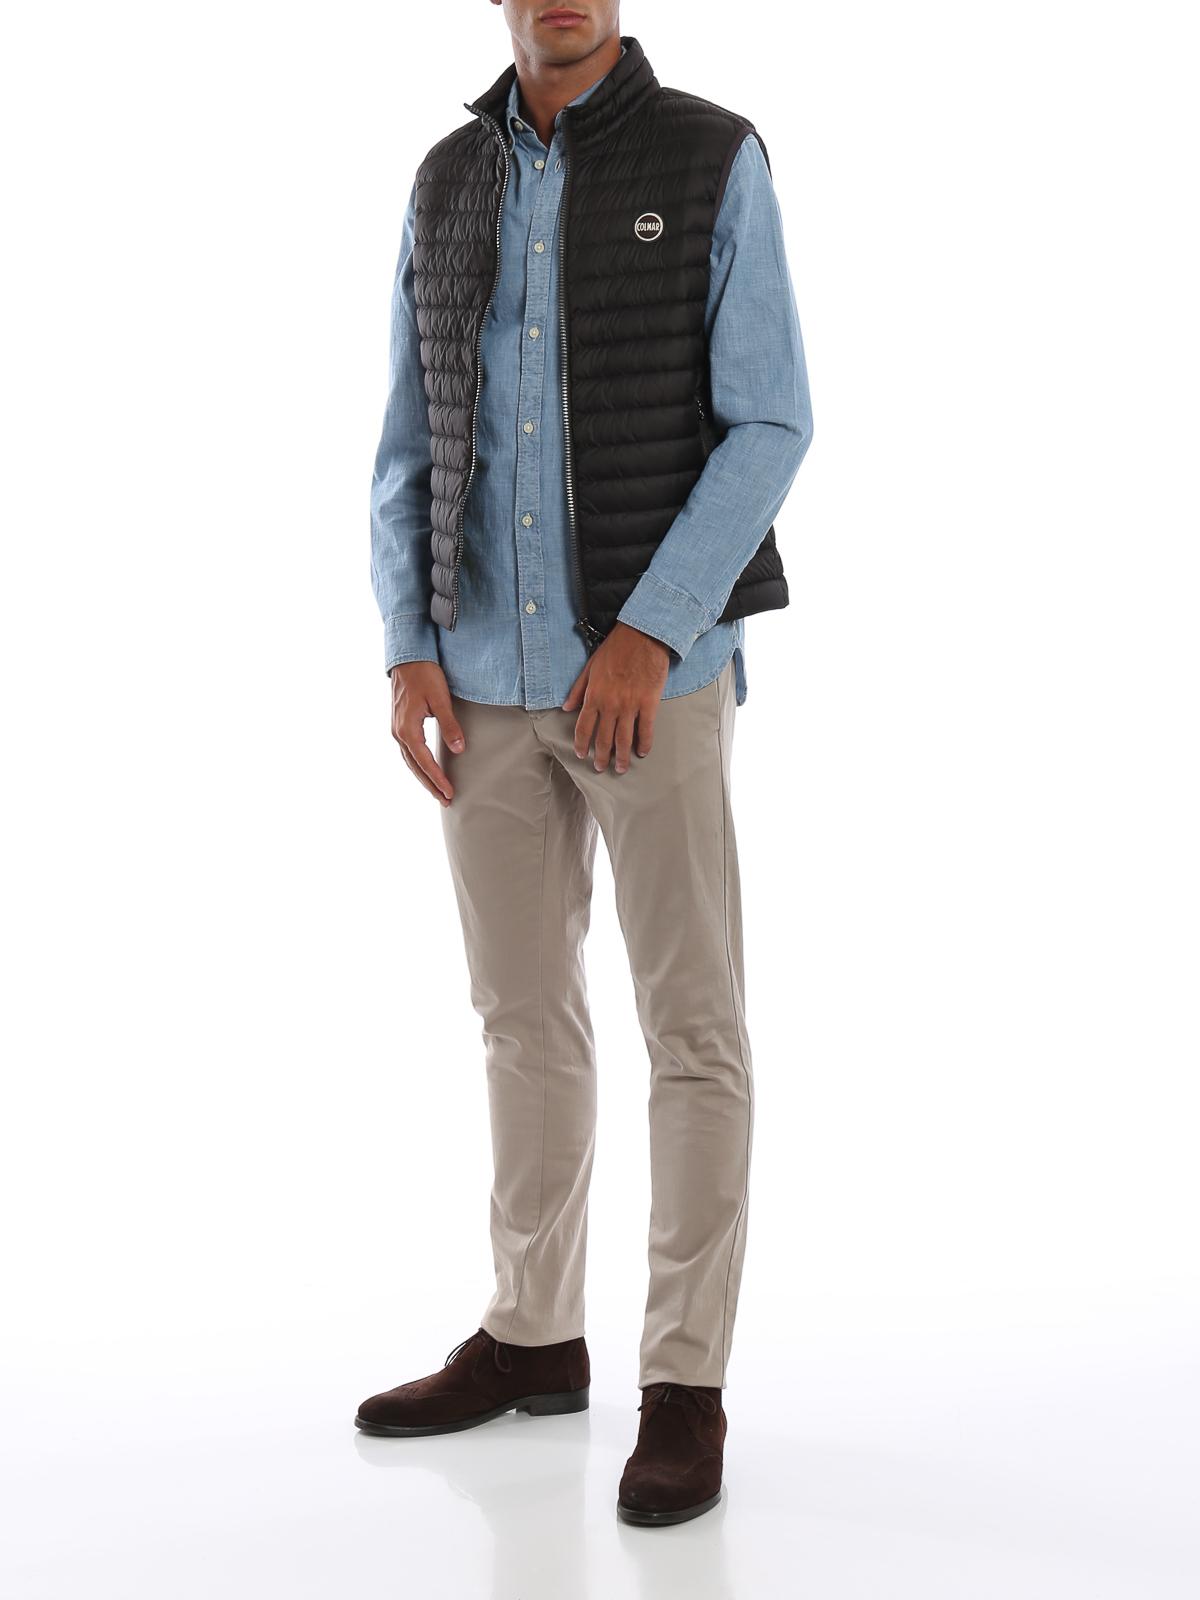 a9f9312027ca colmar-originals-online-waistcoats--gilets-water-repellent-matte-brown-padded-vest-00000137017f00s012.jpg